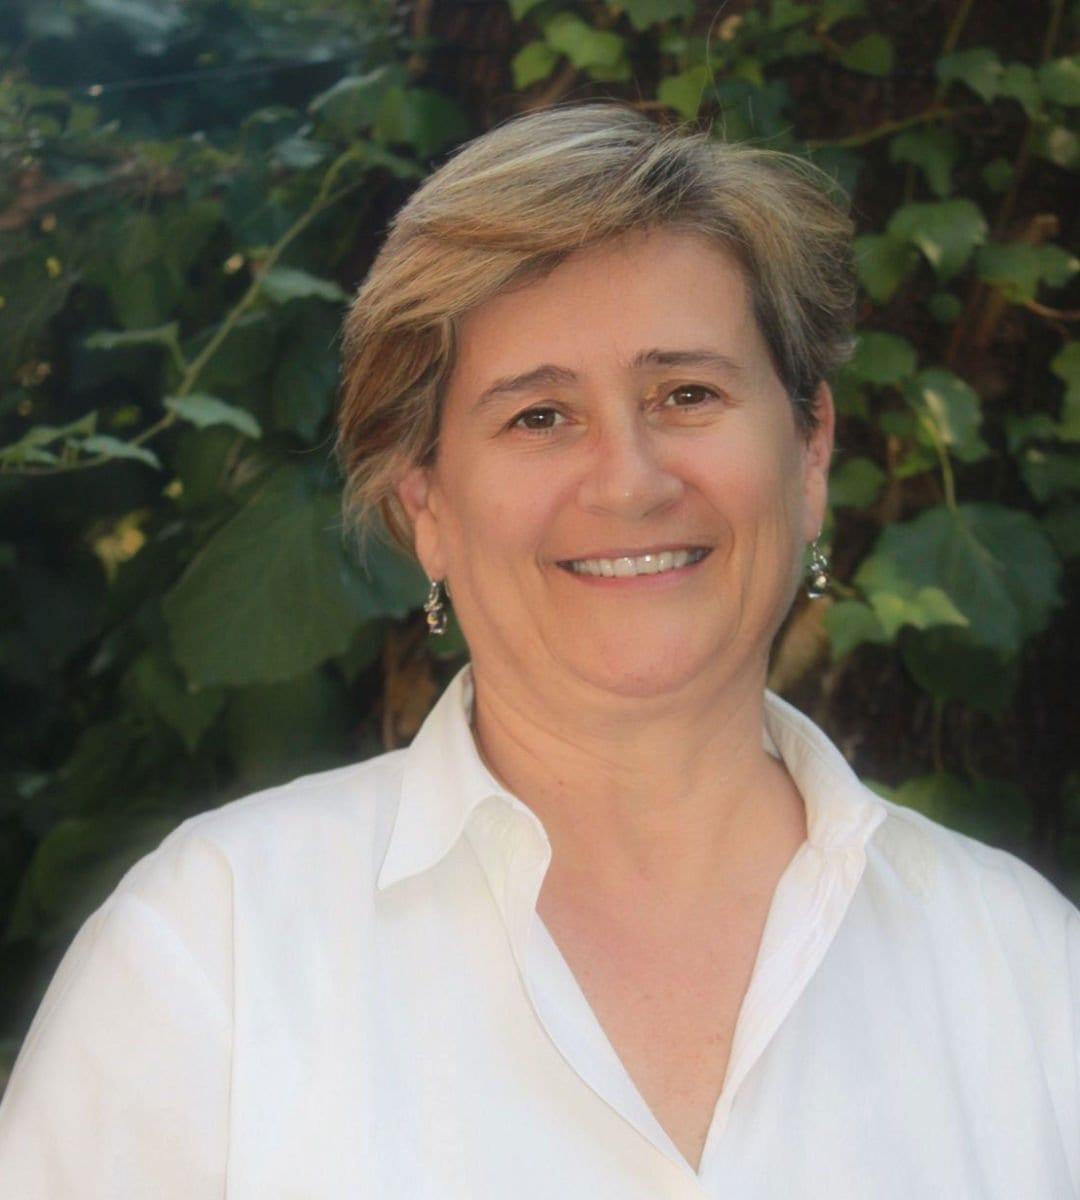 Alessandra Marchioni